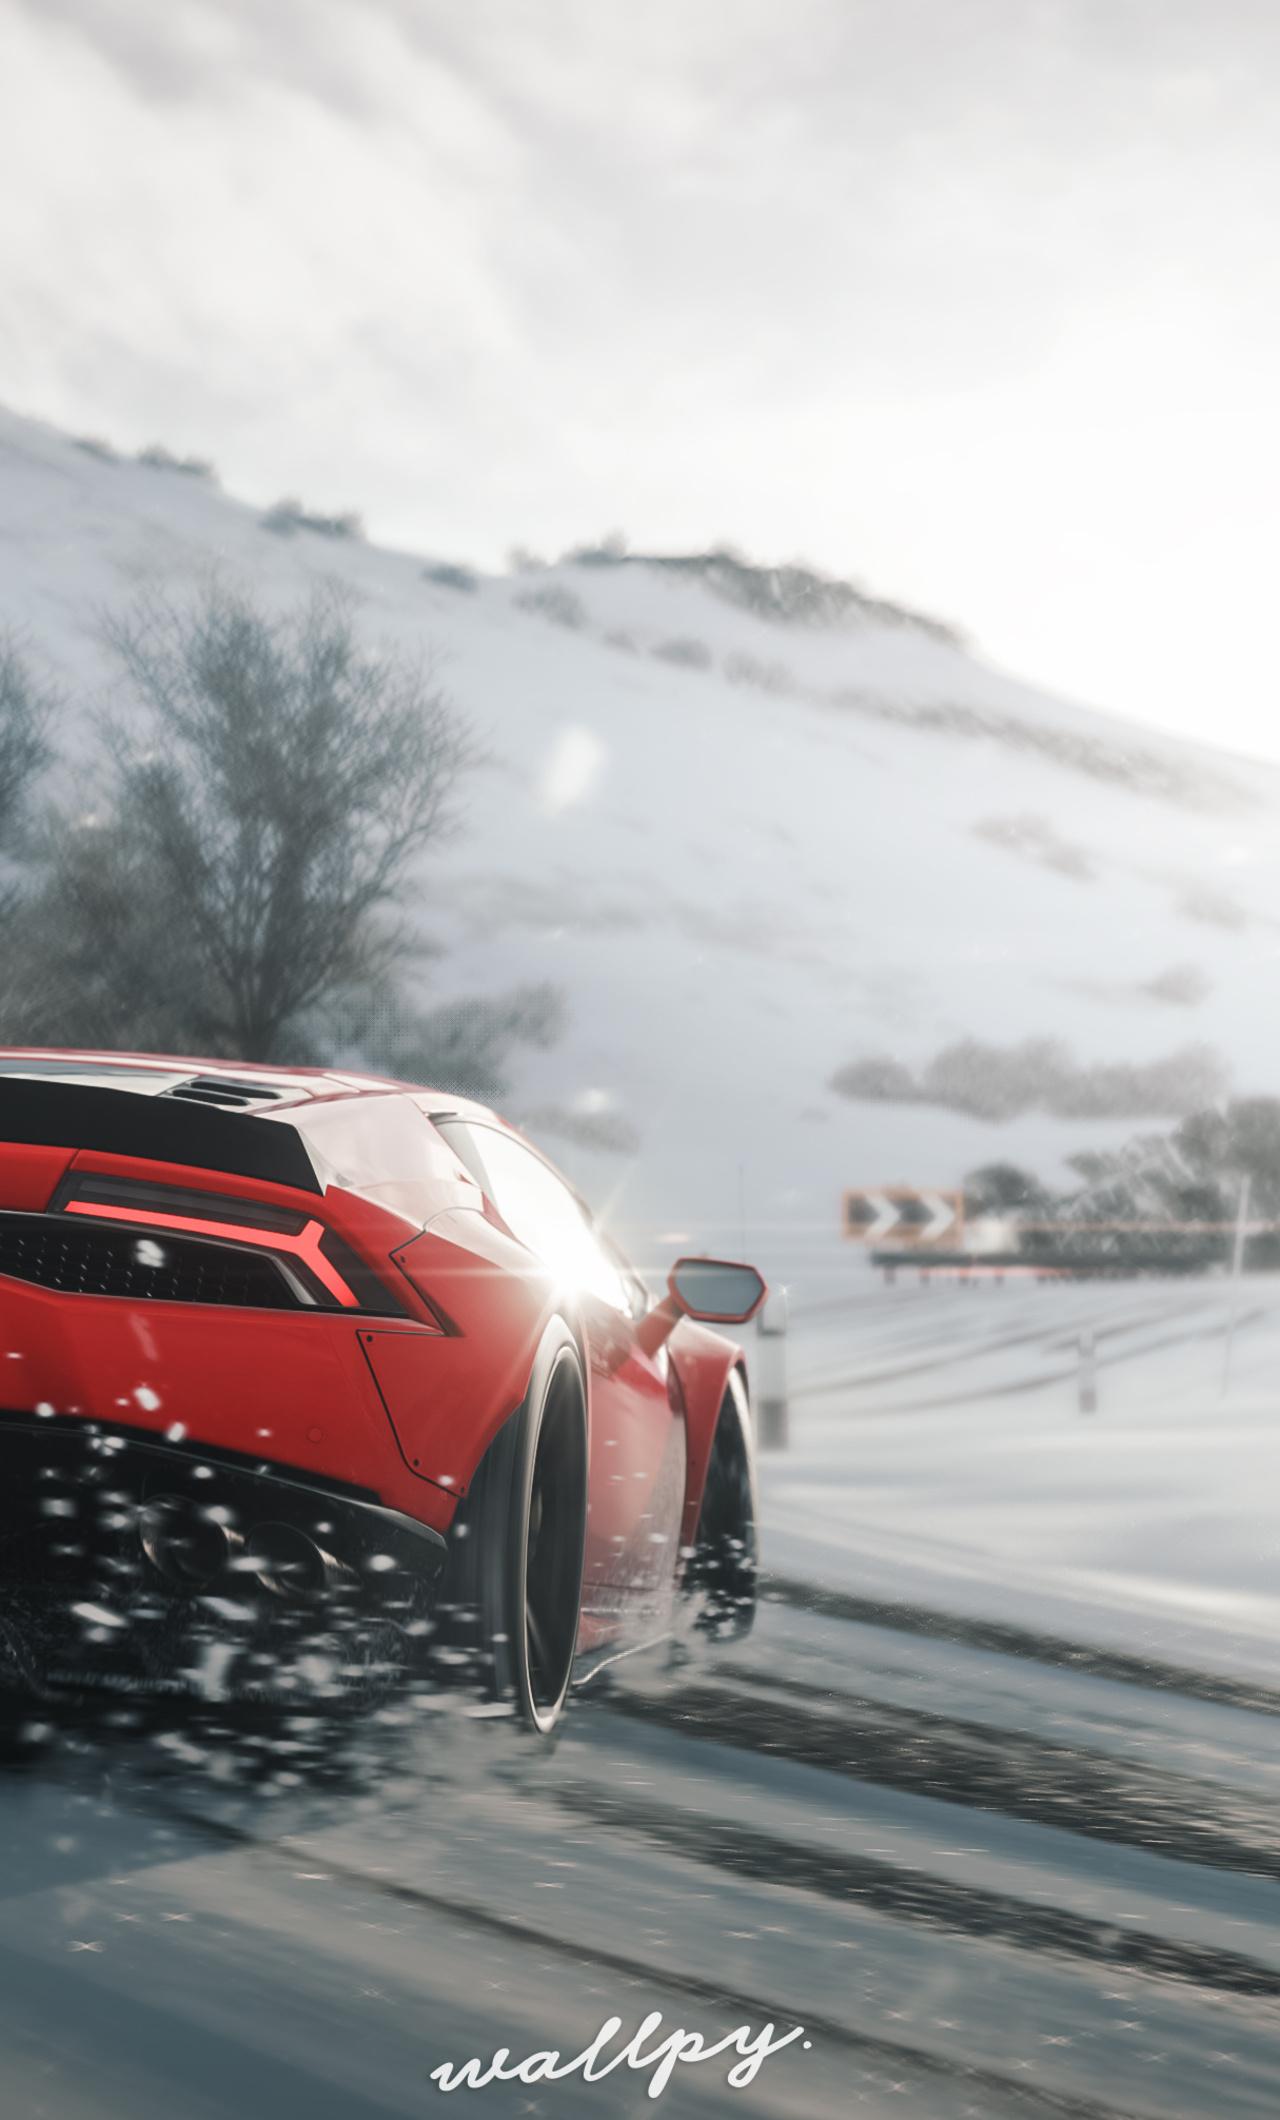 1280x2120 Lamborghini Huracan Drift In Snow Forza Horizon 4 Iphone 6